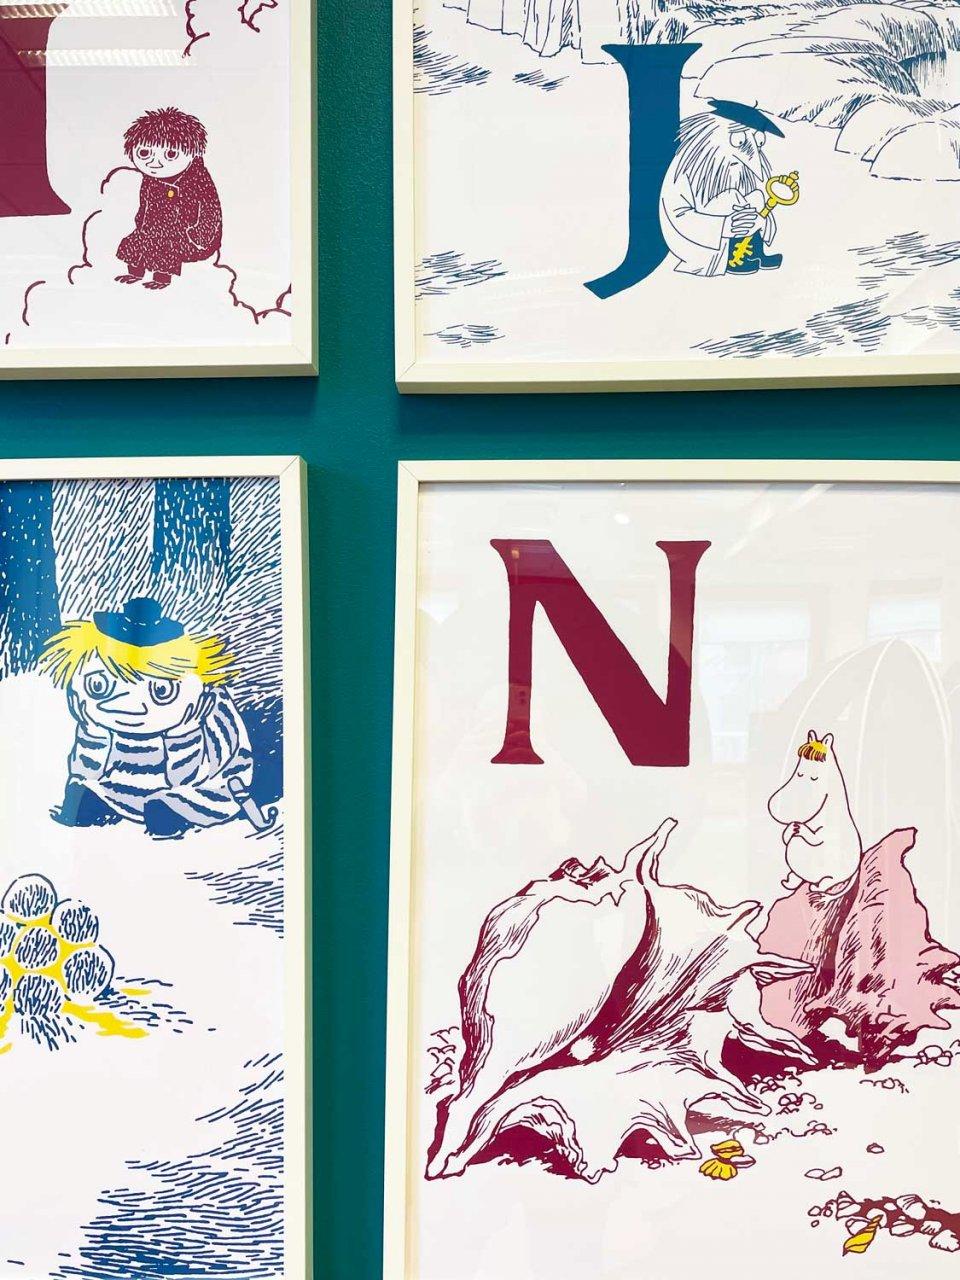 ABC Moomin Exhibition